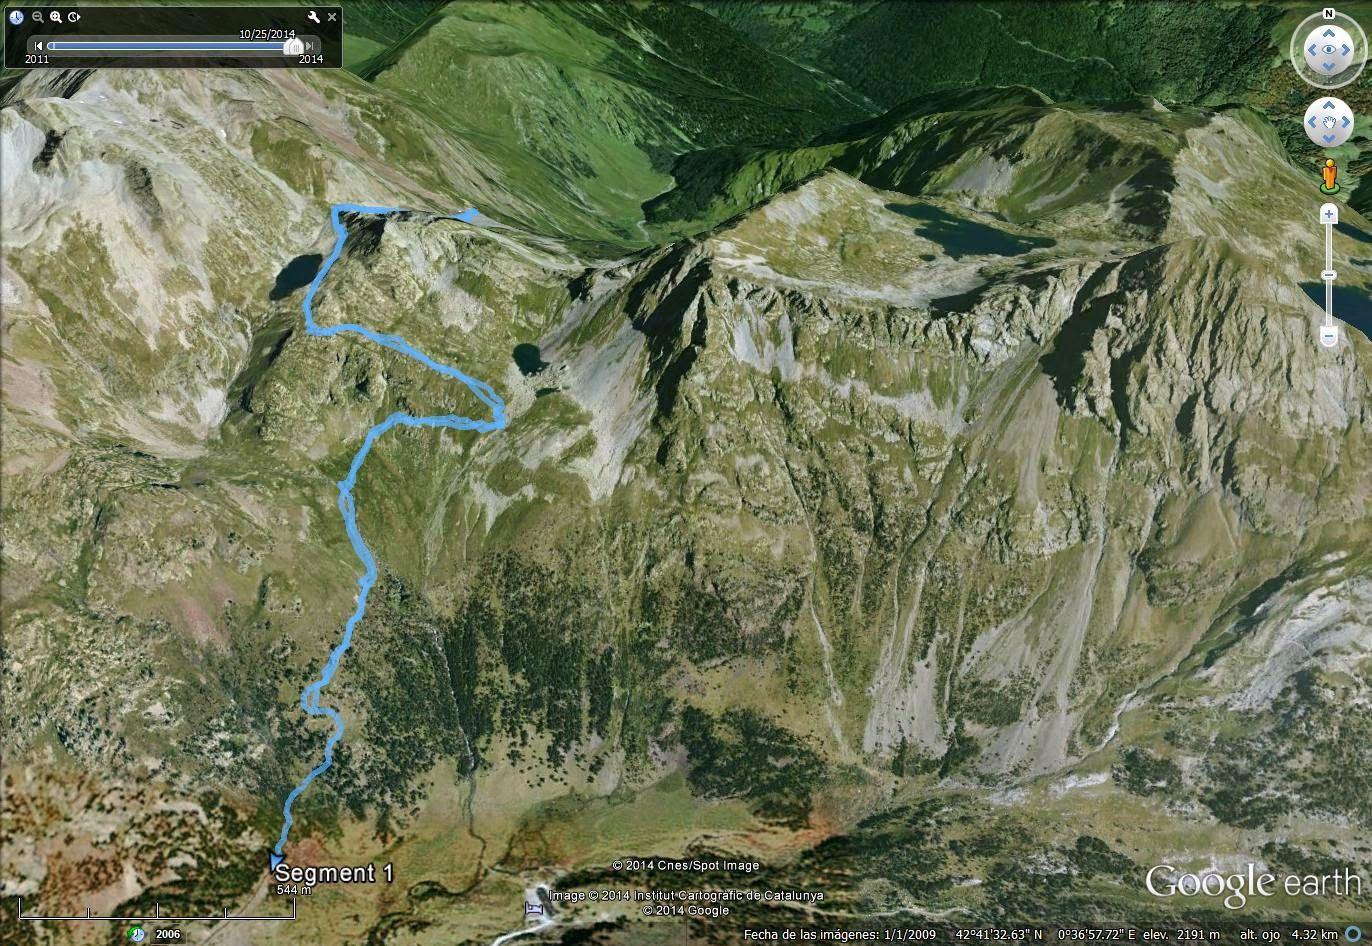 GorgutesNOV14 3 - Subiendo al pico Sacroux, Valle de Benasque